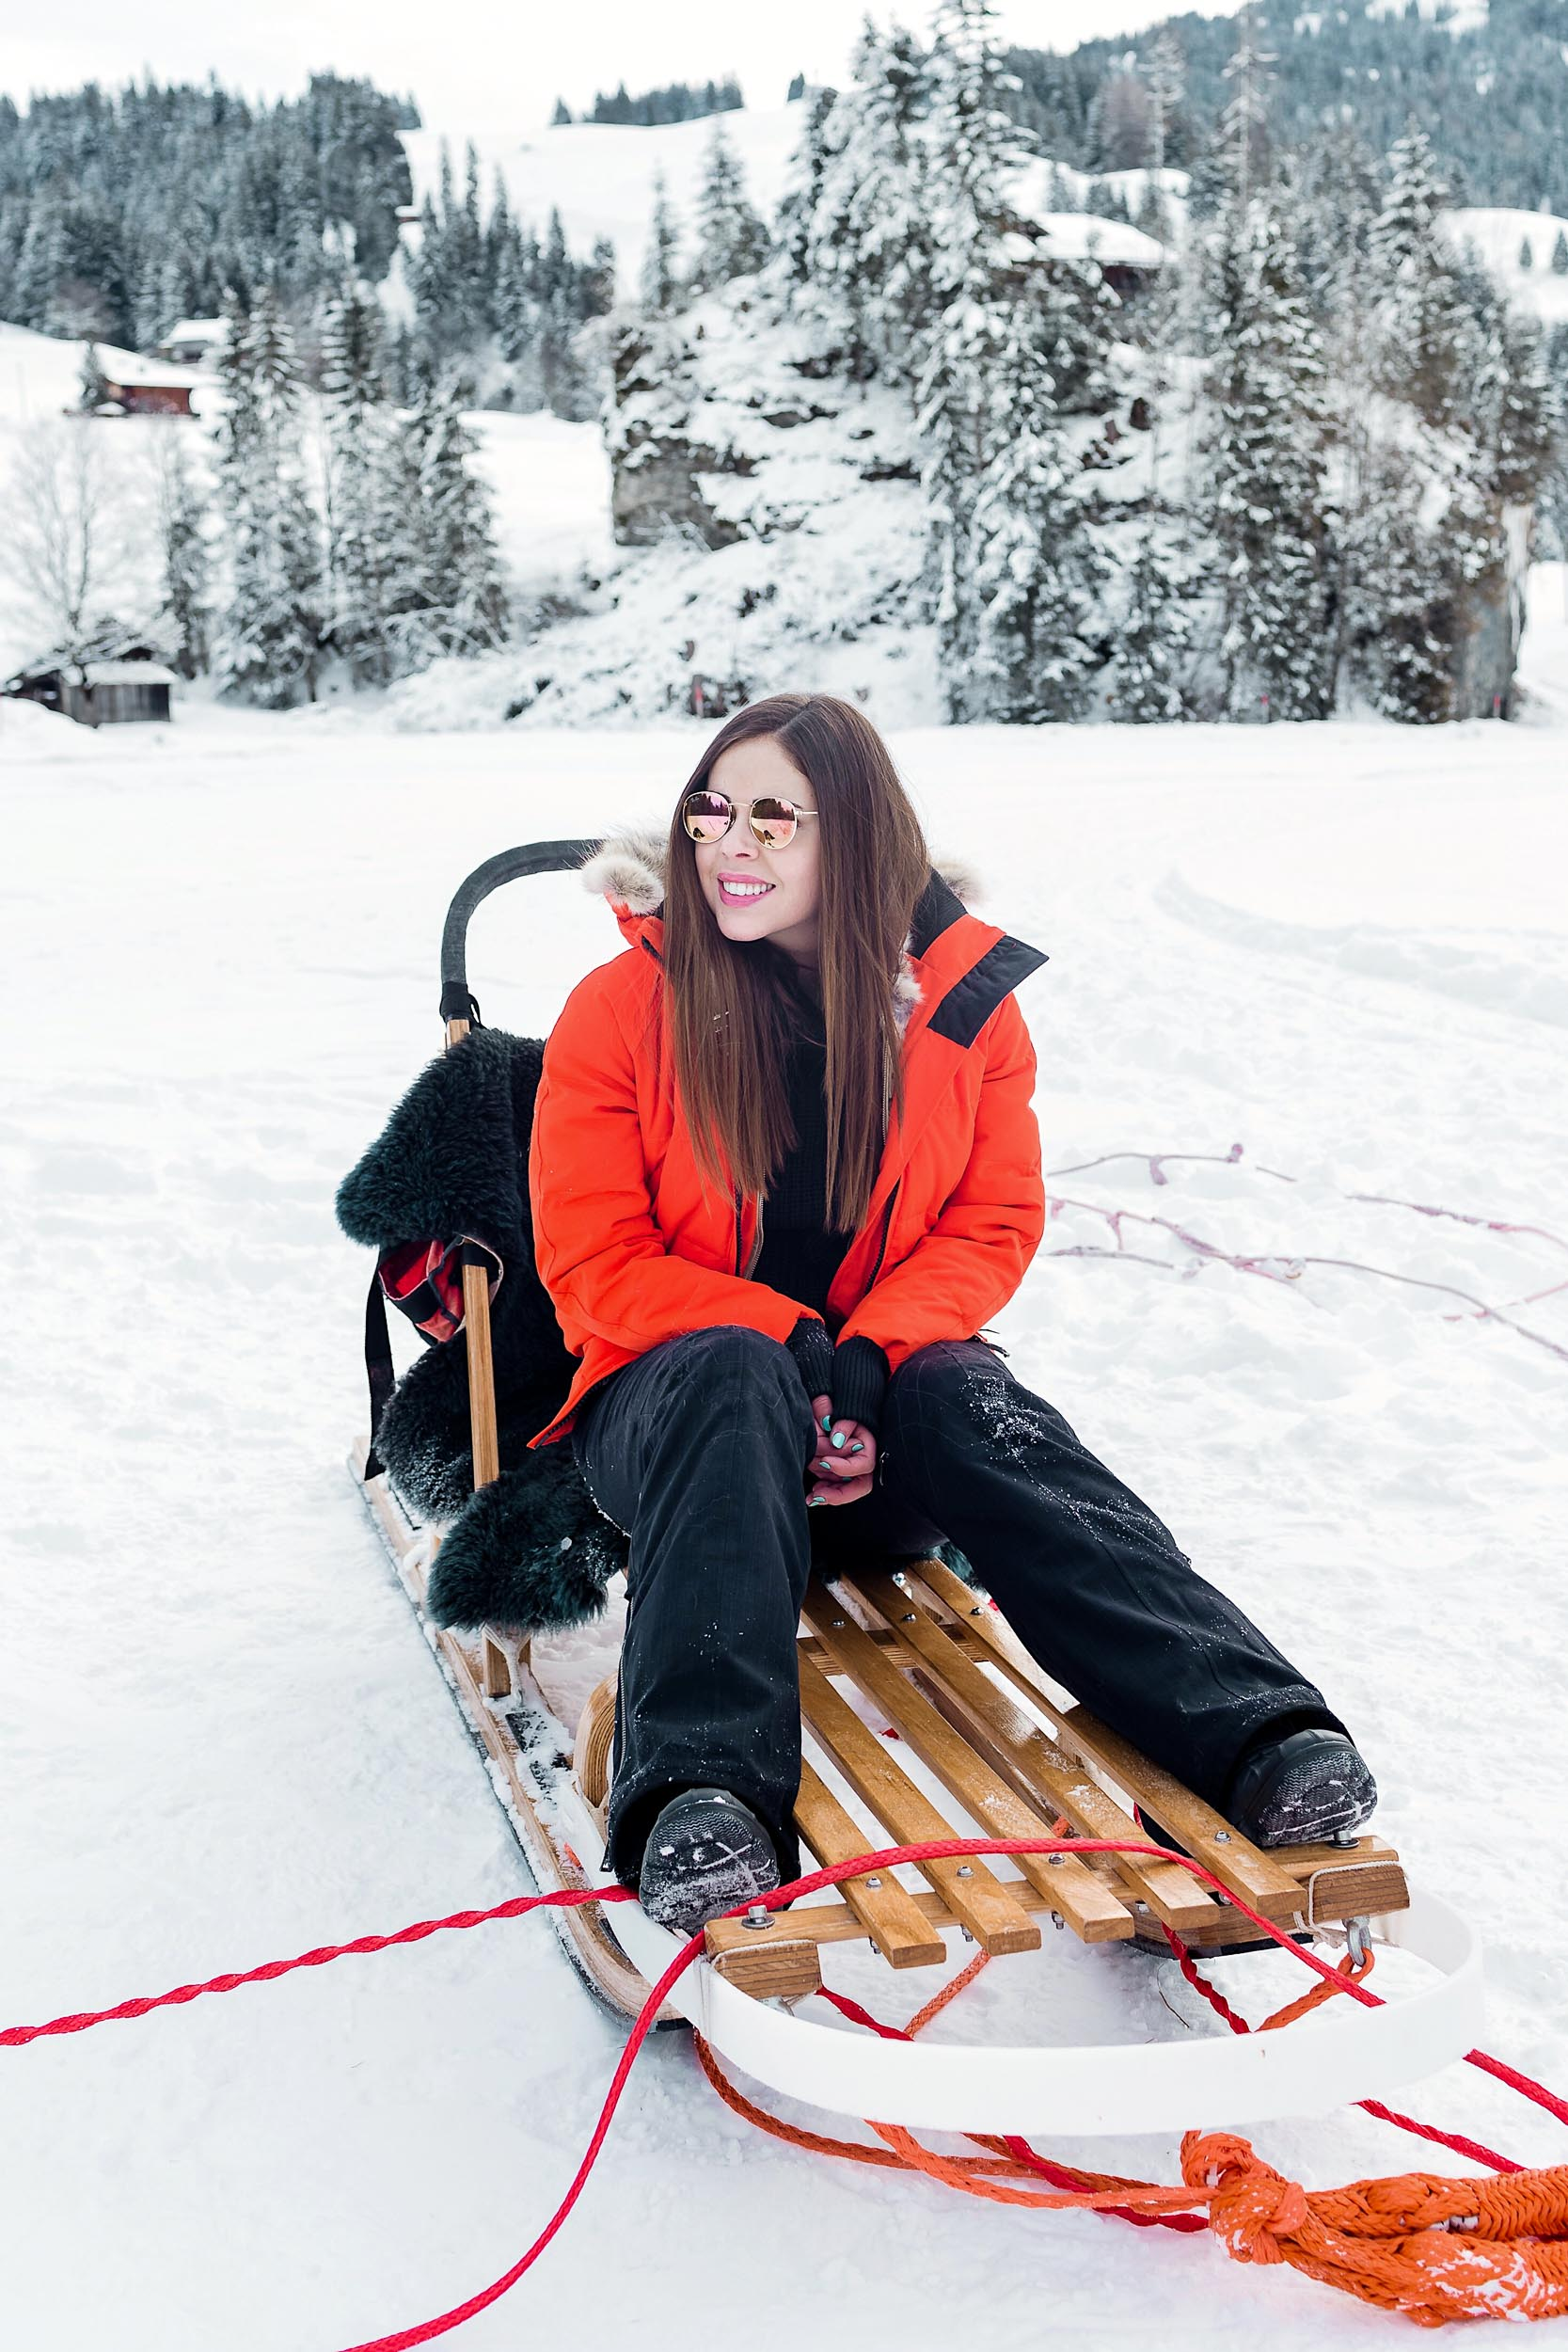 Dog sledding in Switzerland - the perfect winter adventure!